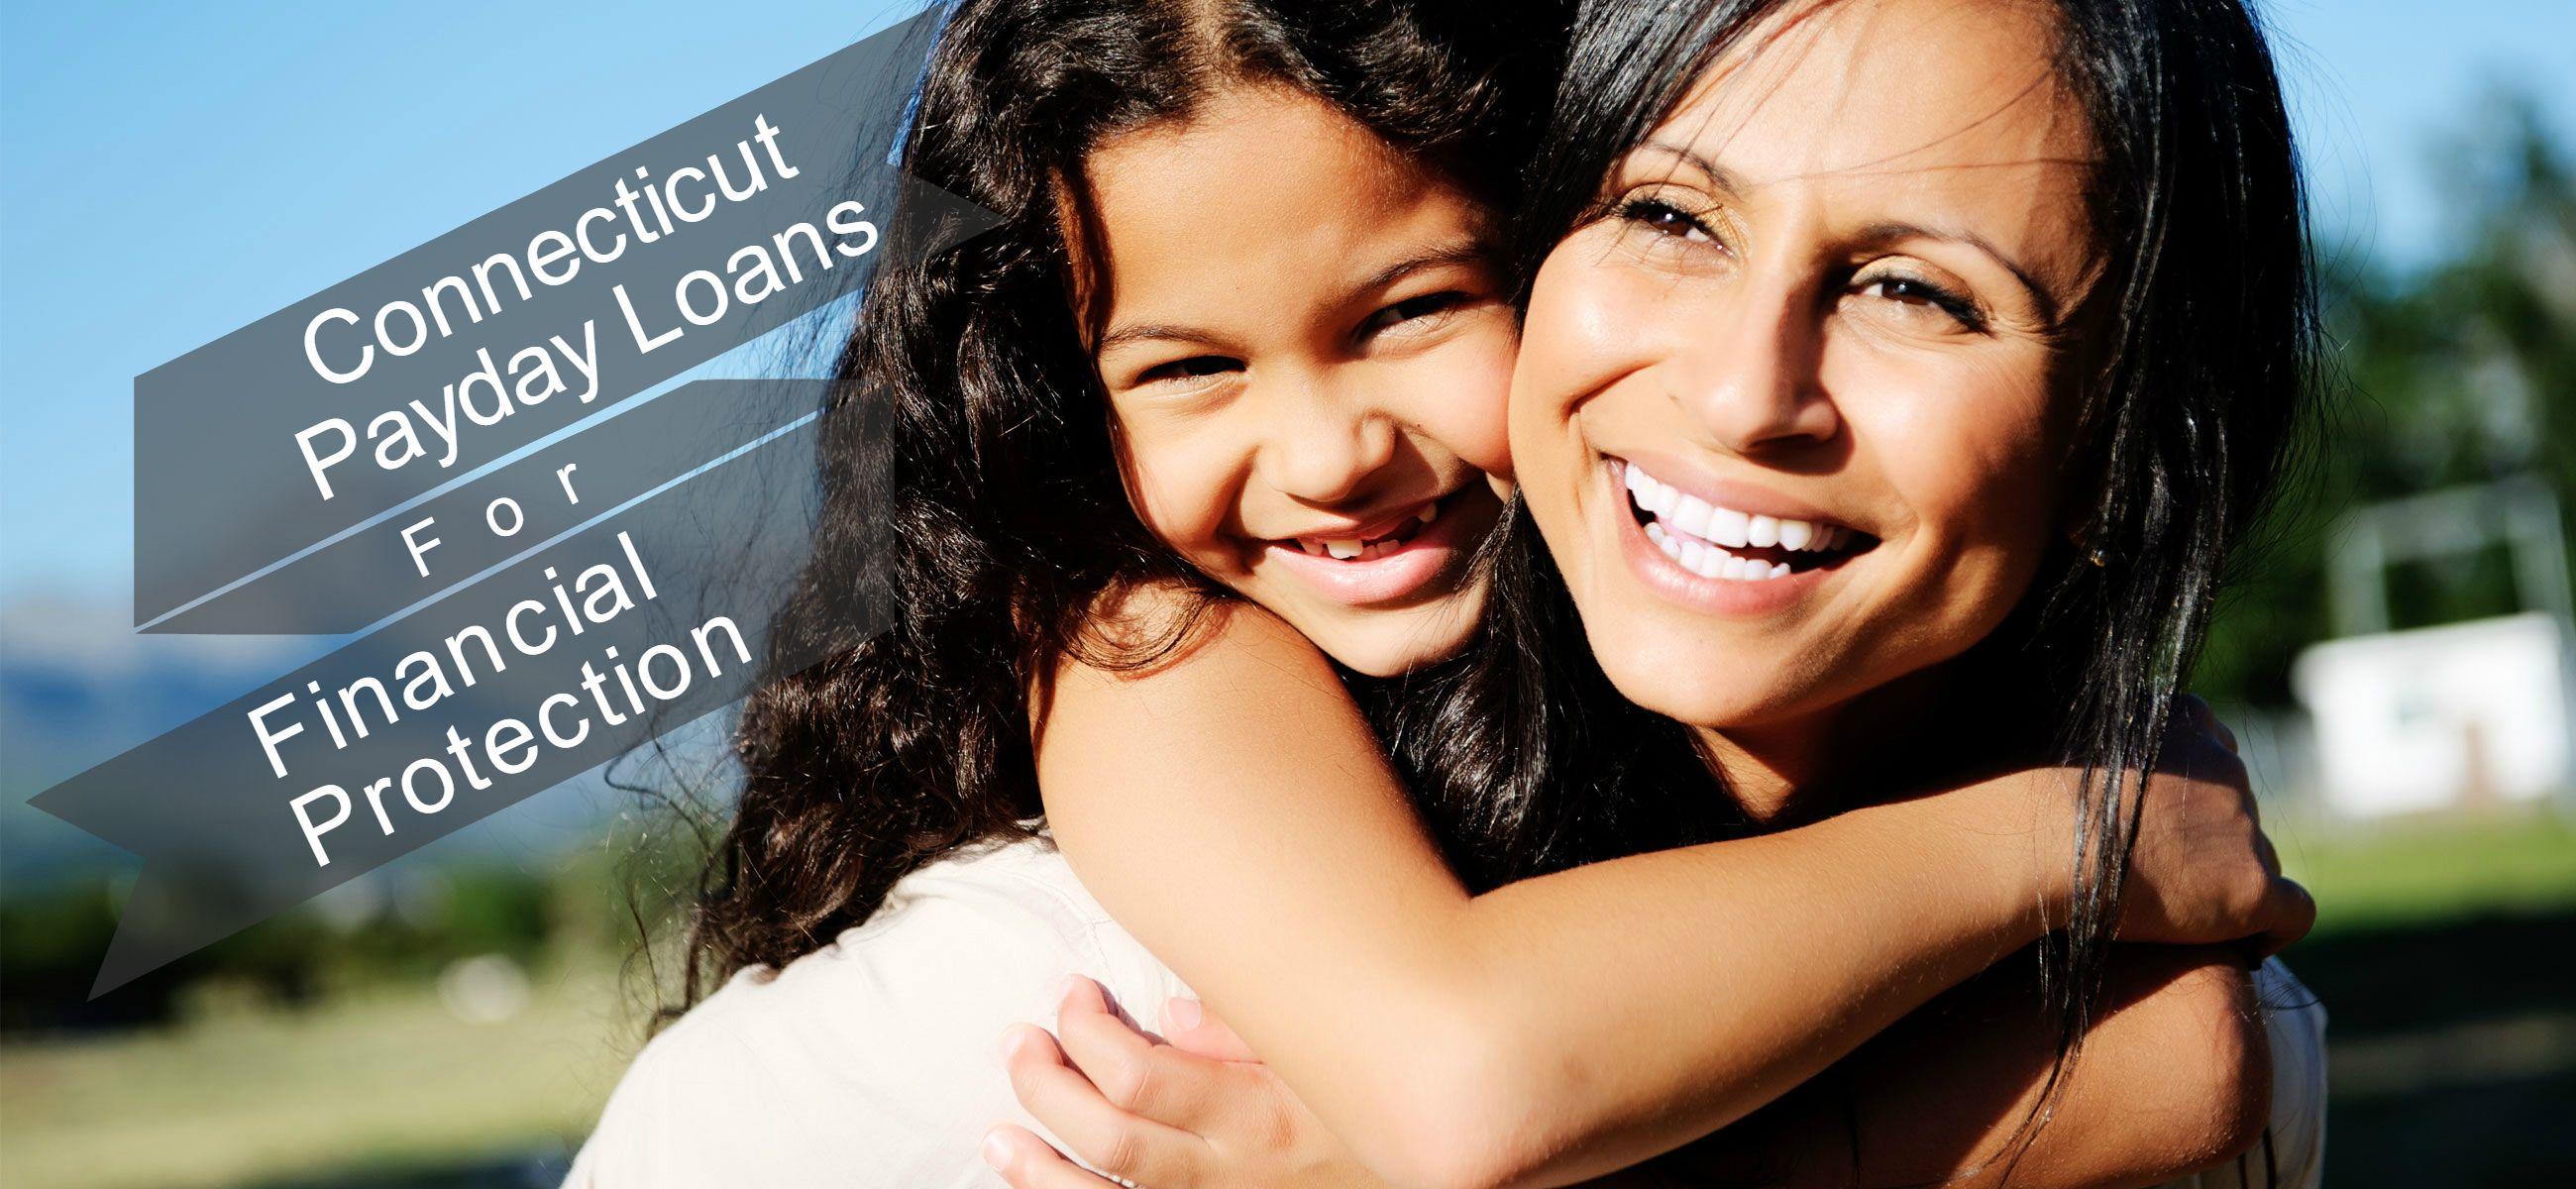 Cash loan in 1 hour delhi image 6